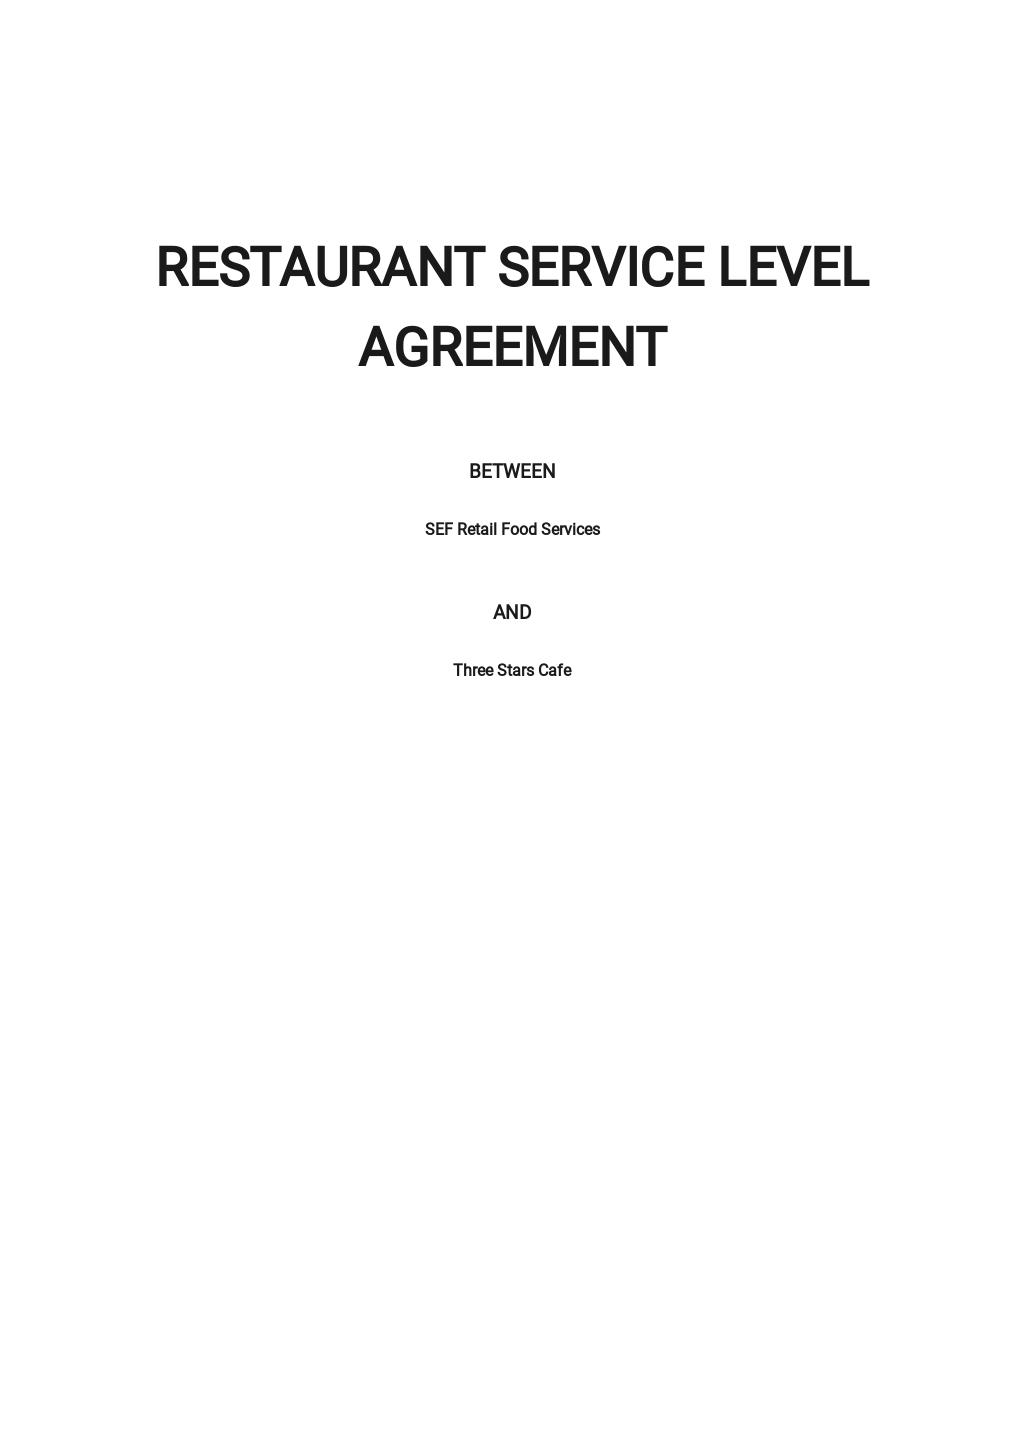 Restaurant Service Level Agreement Template.jpe